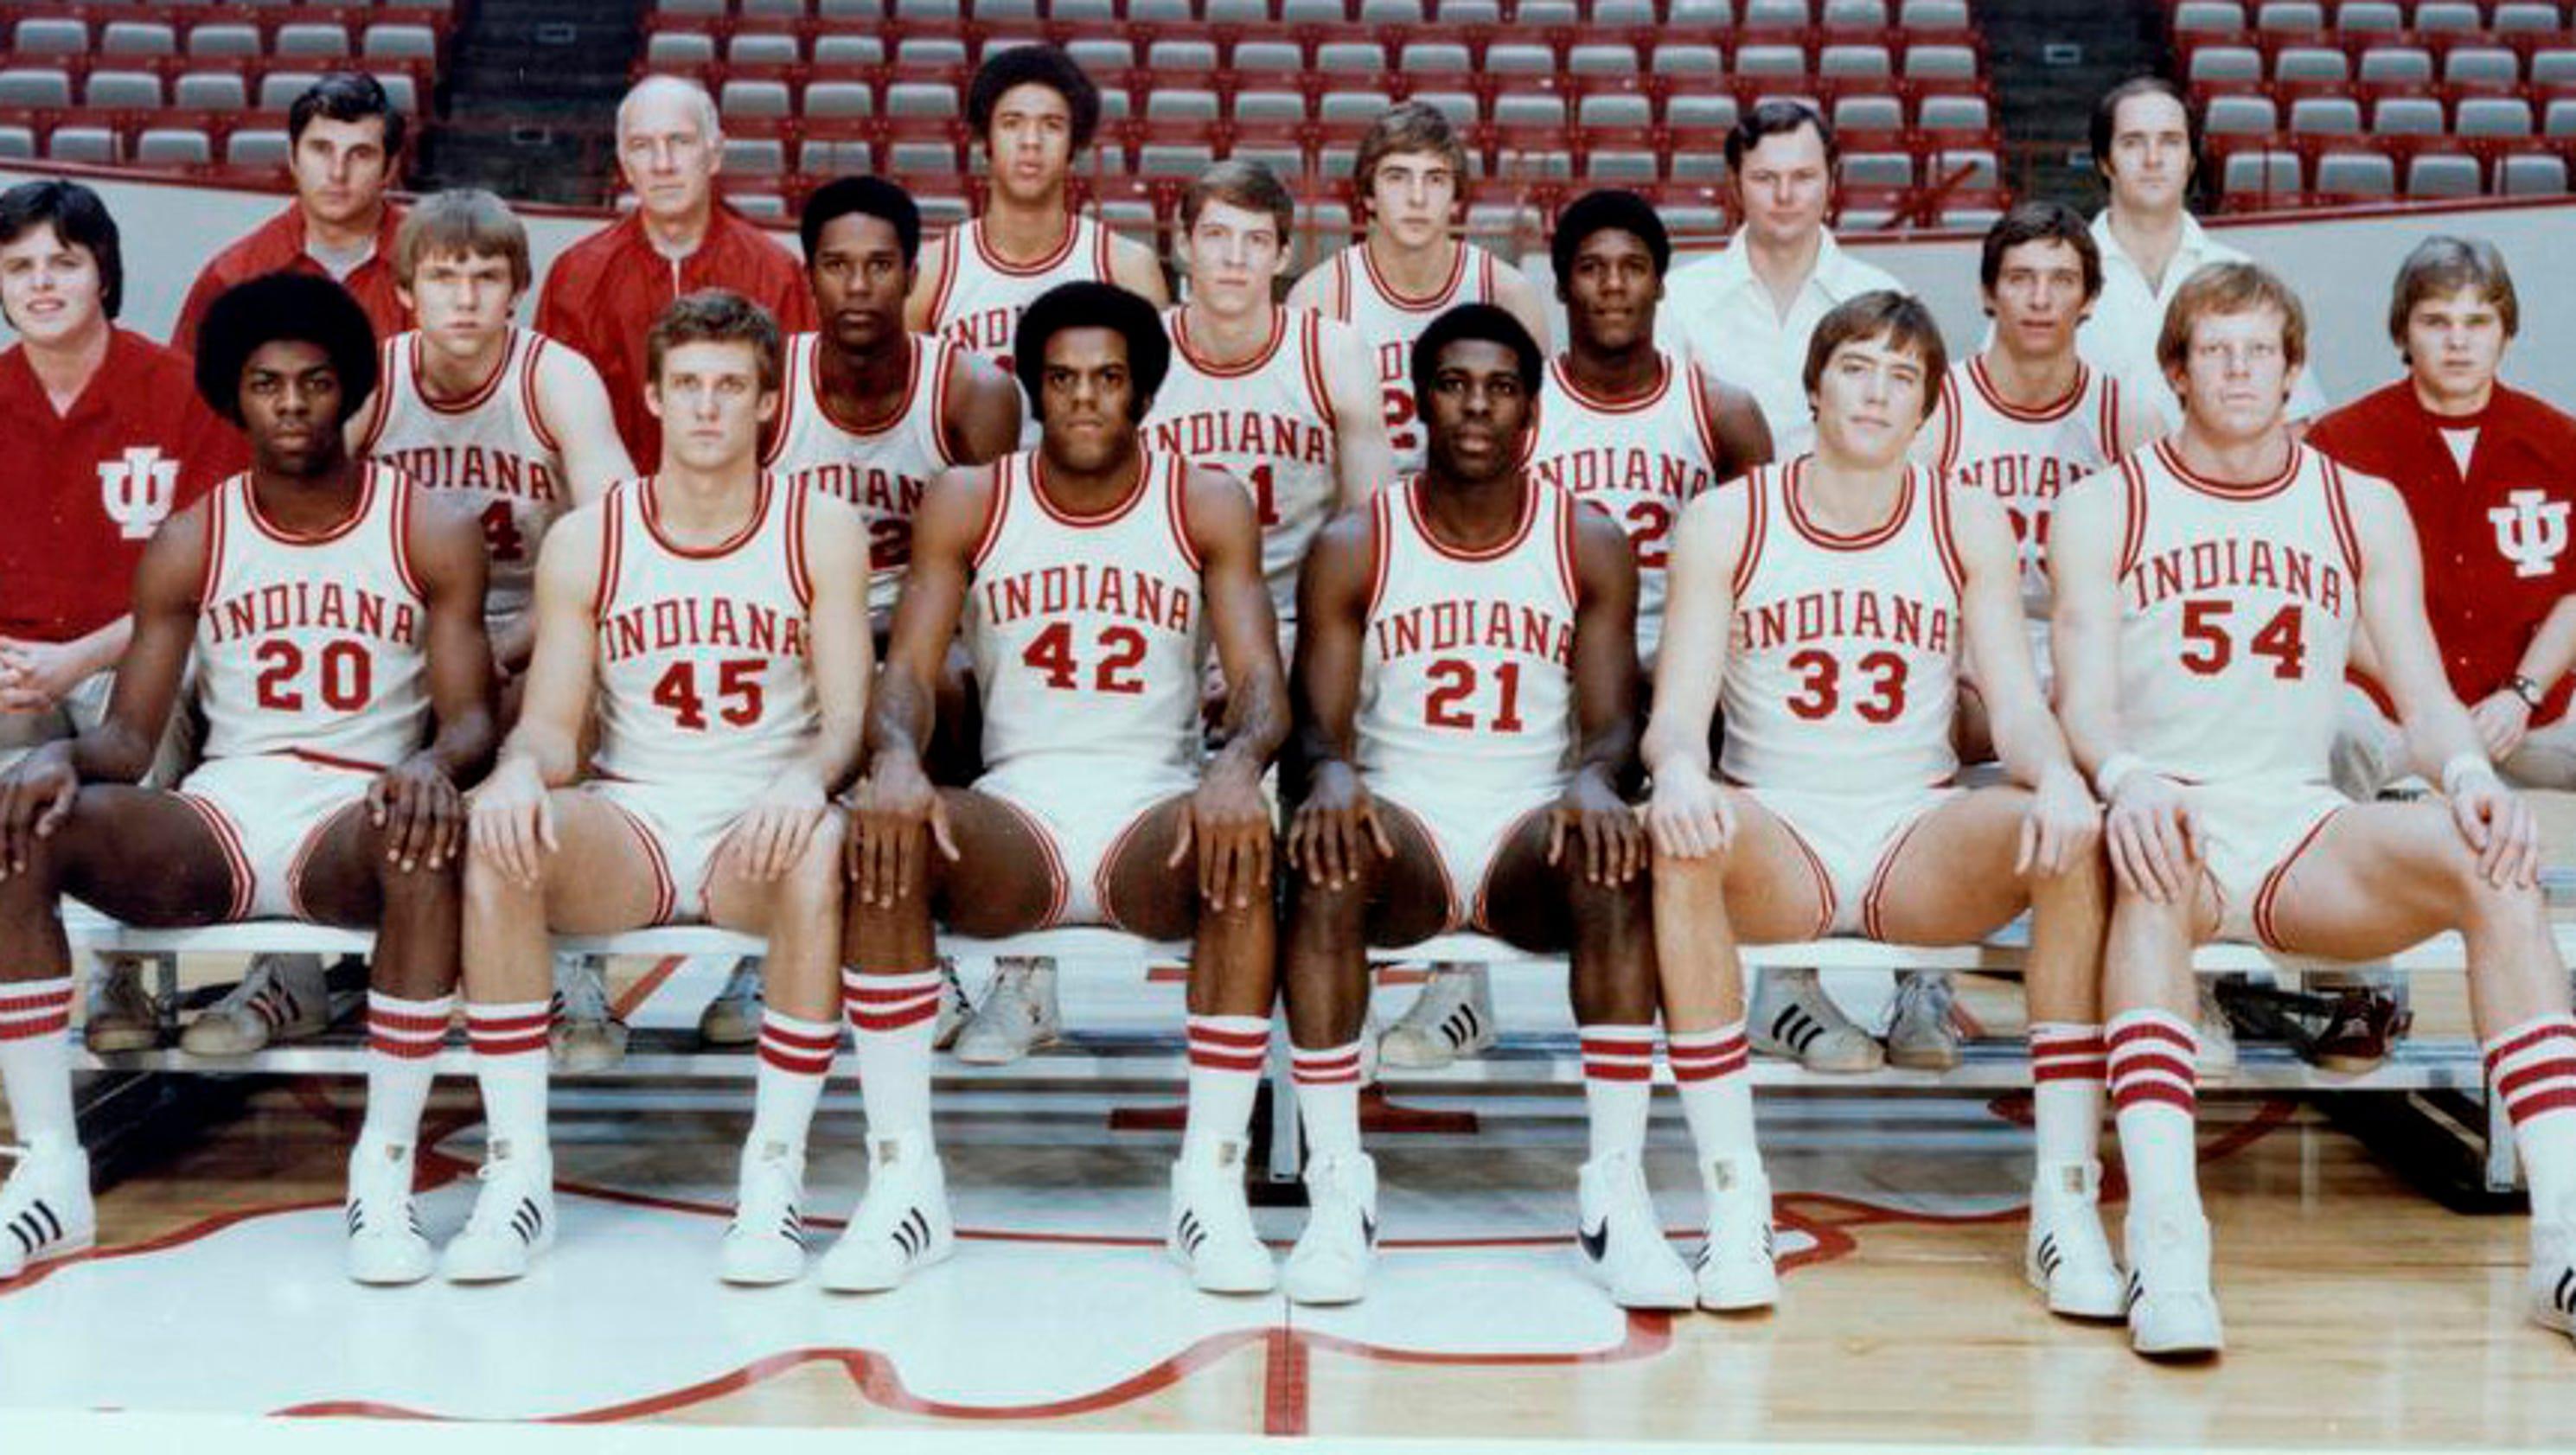 1976 Indiana University basketball team